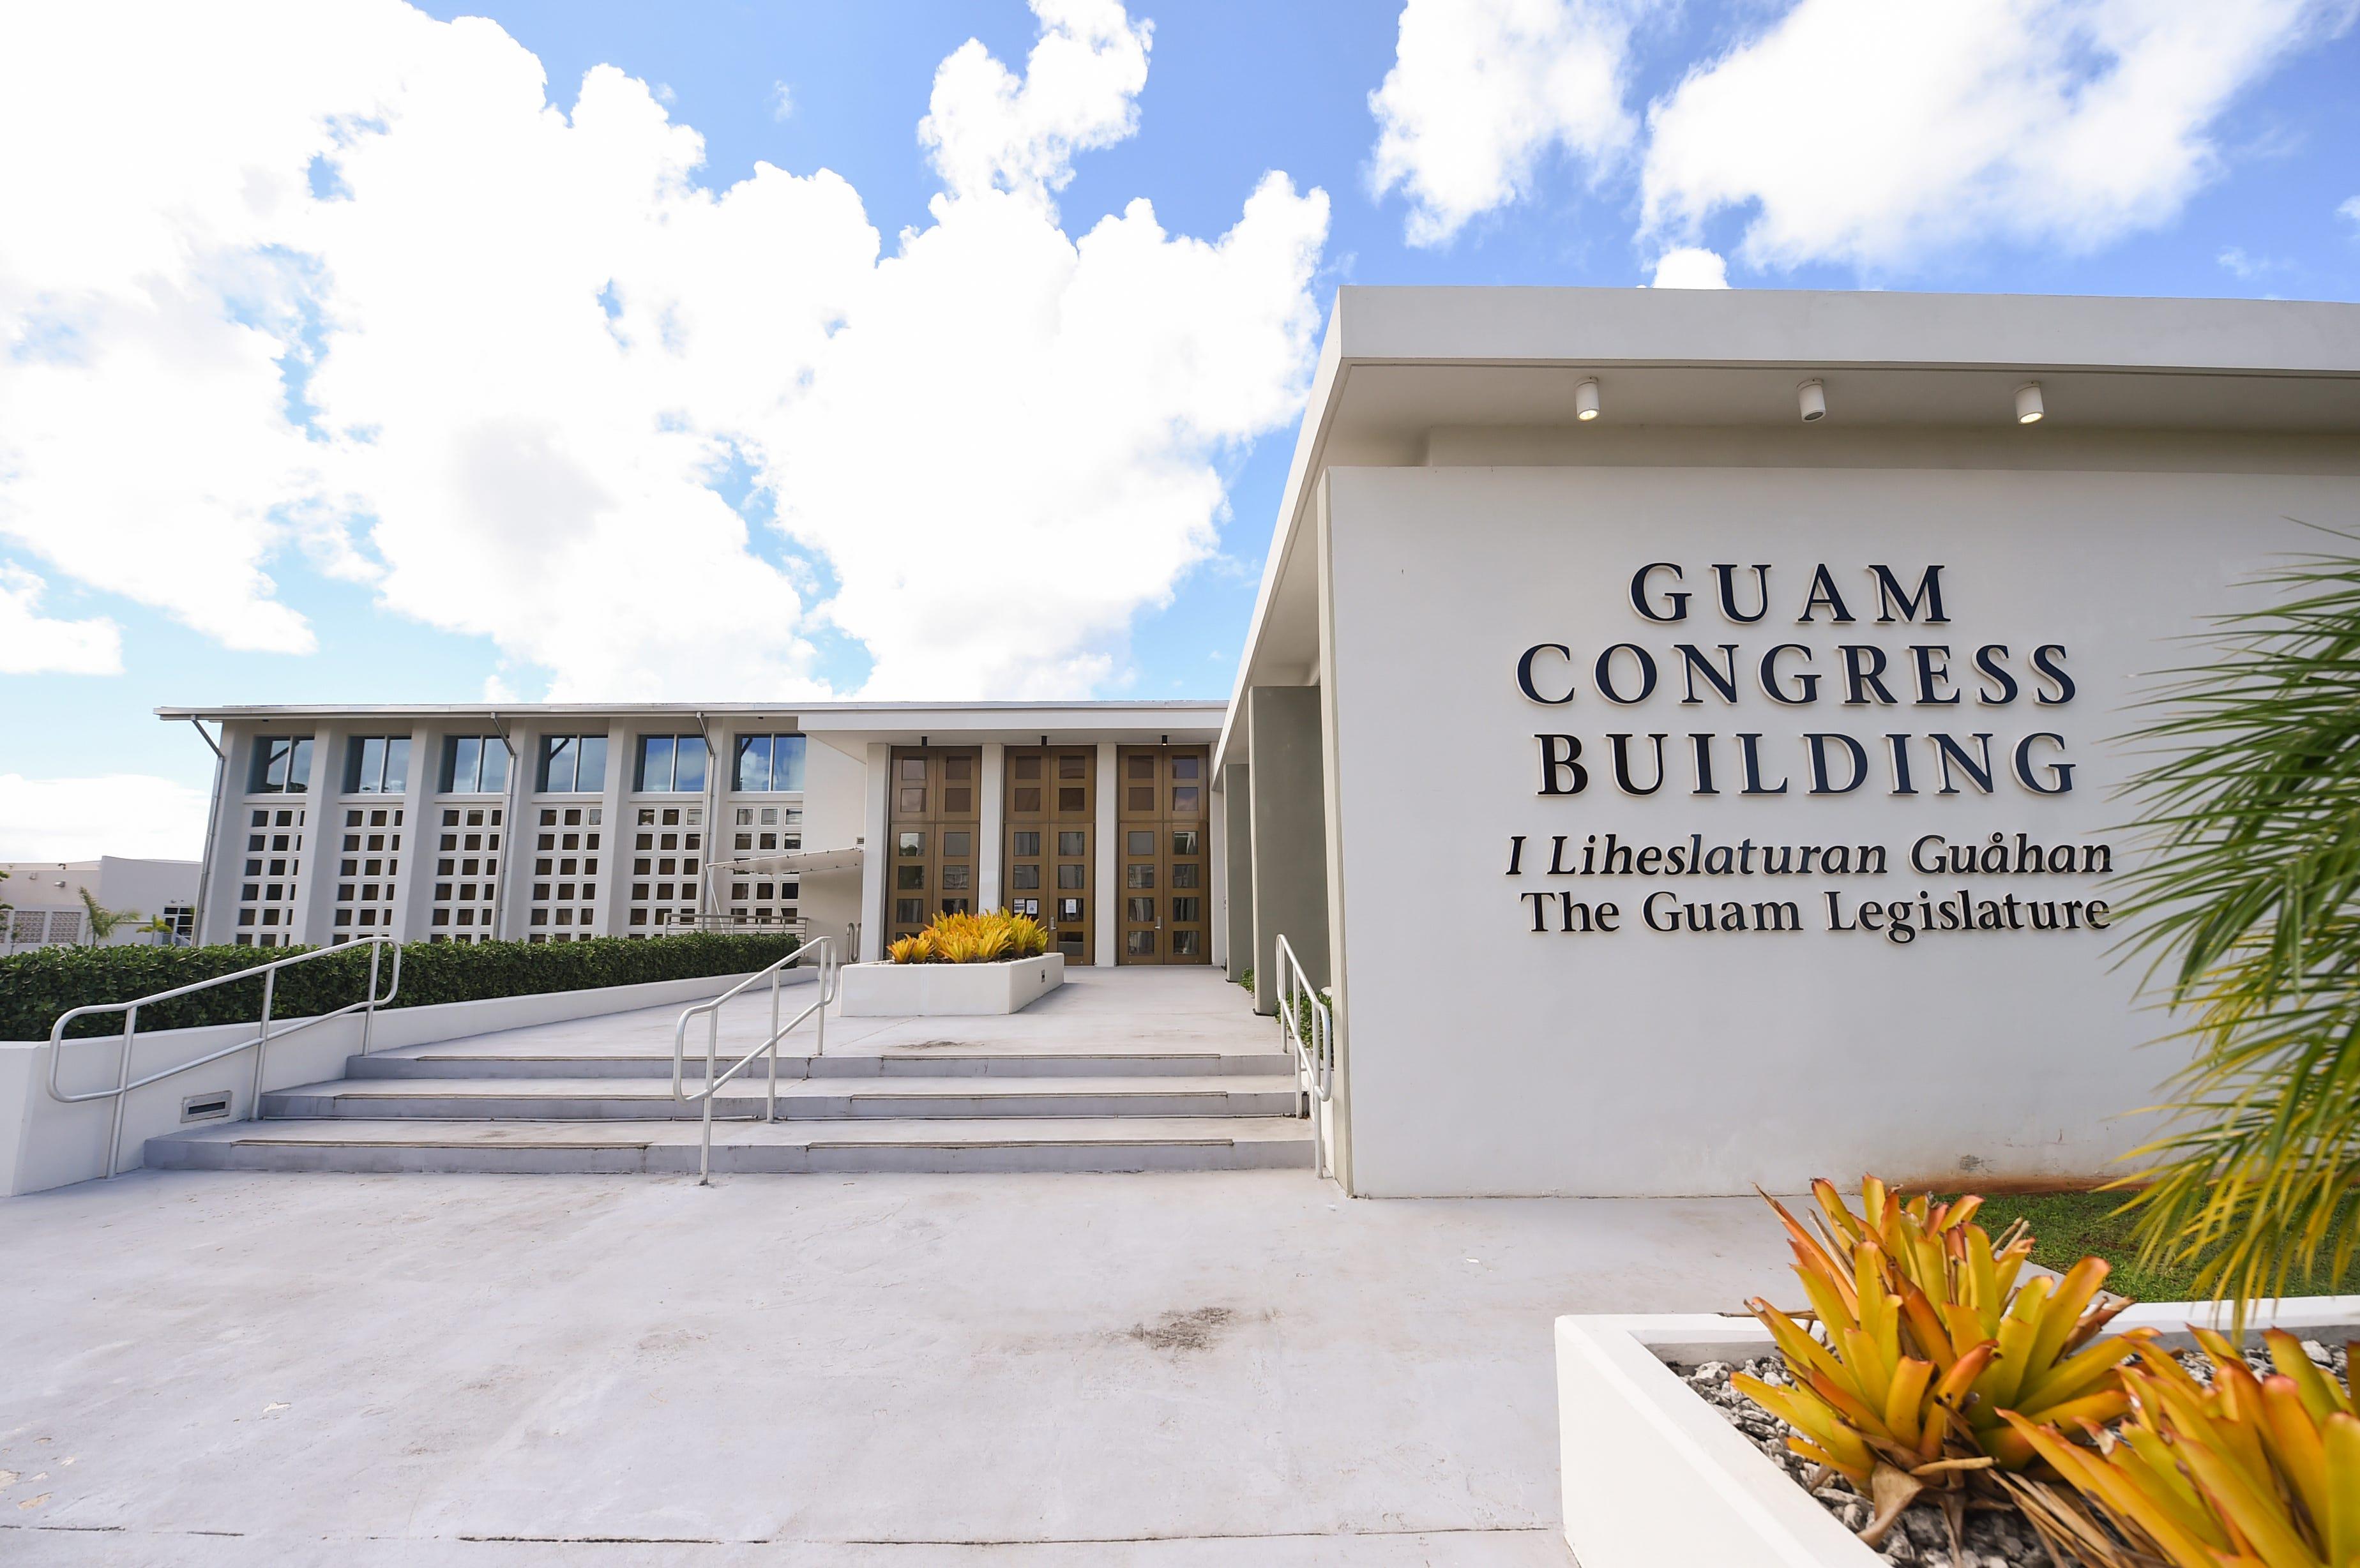 The Guam Congress Building in Hagåtña on July 7, 2020.